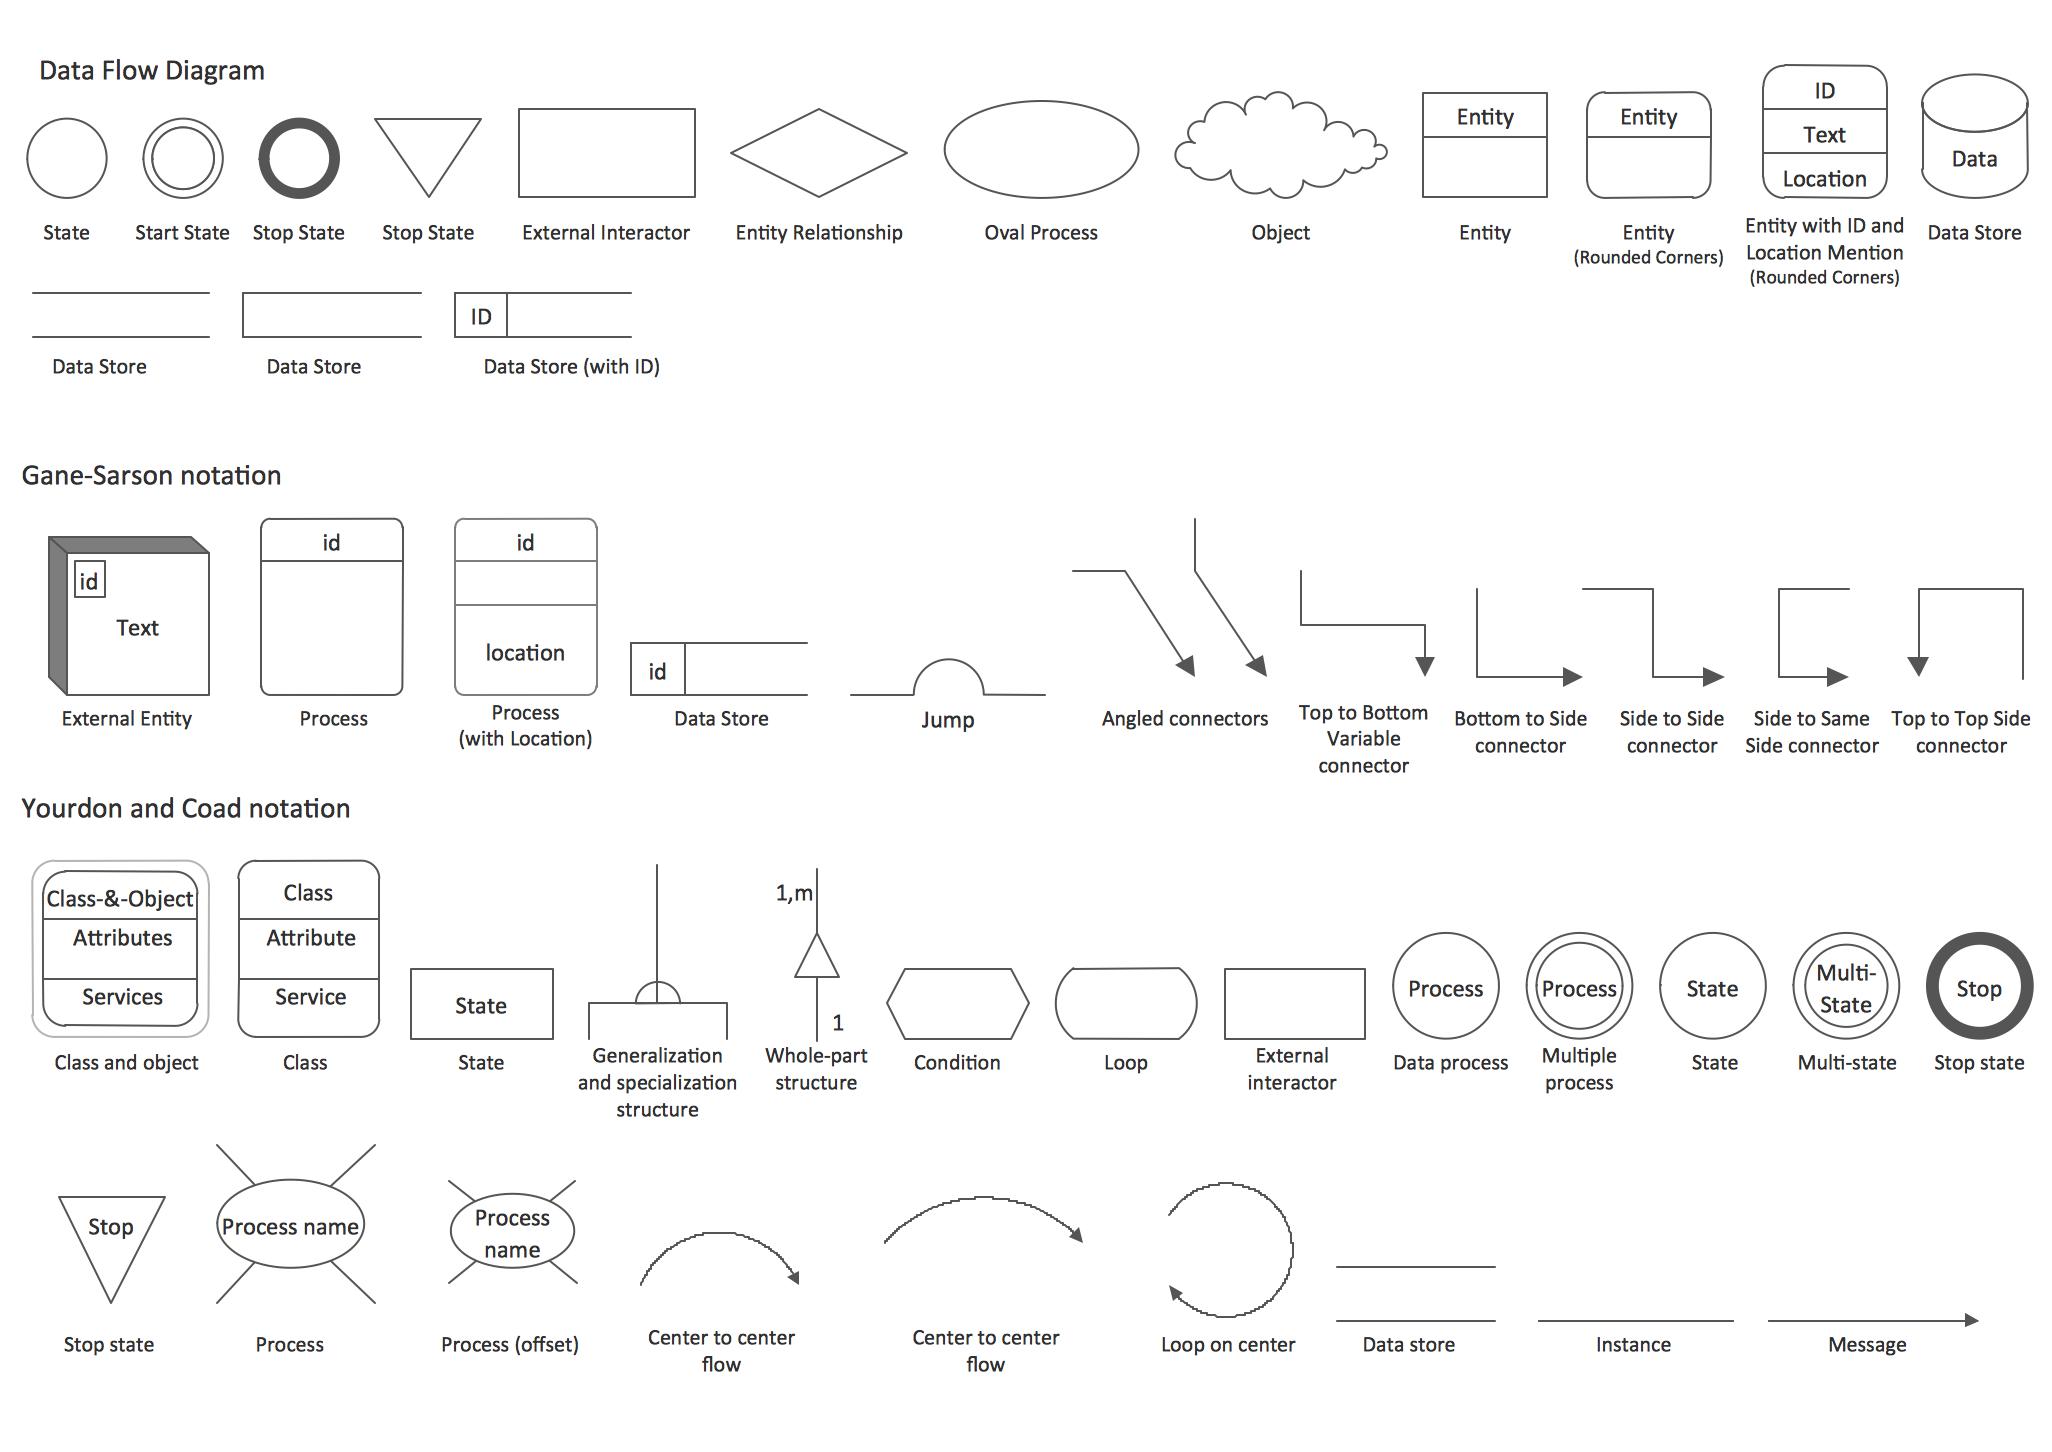 Data Flow Diagram Dfd Process Vs Library Of Account Receivable Uml Class